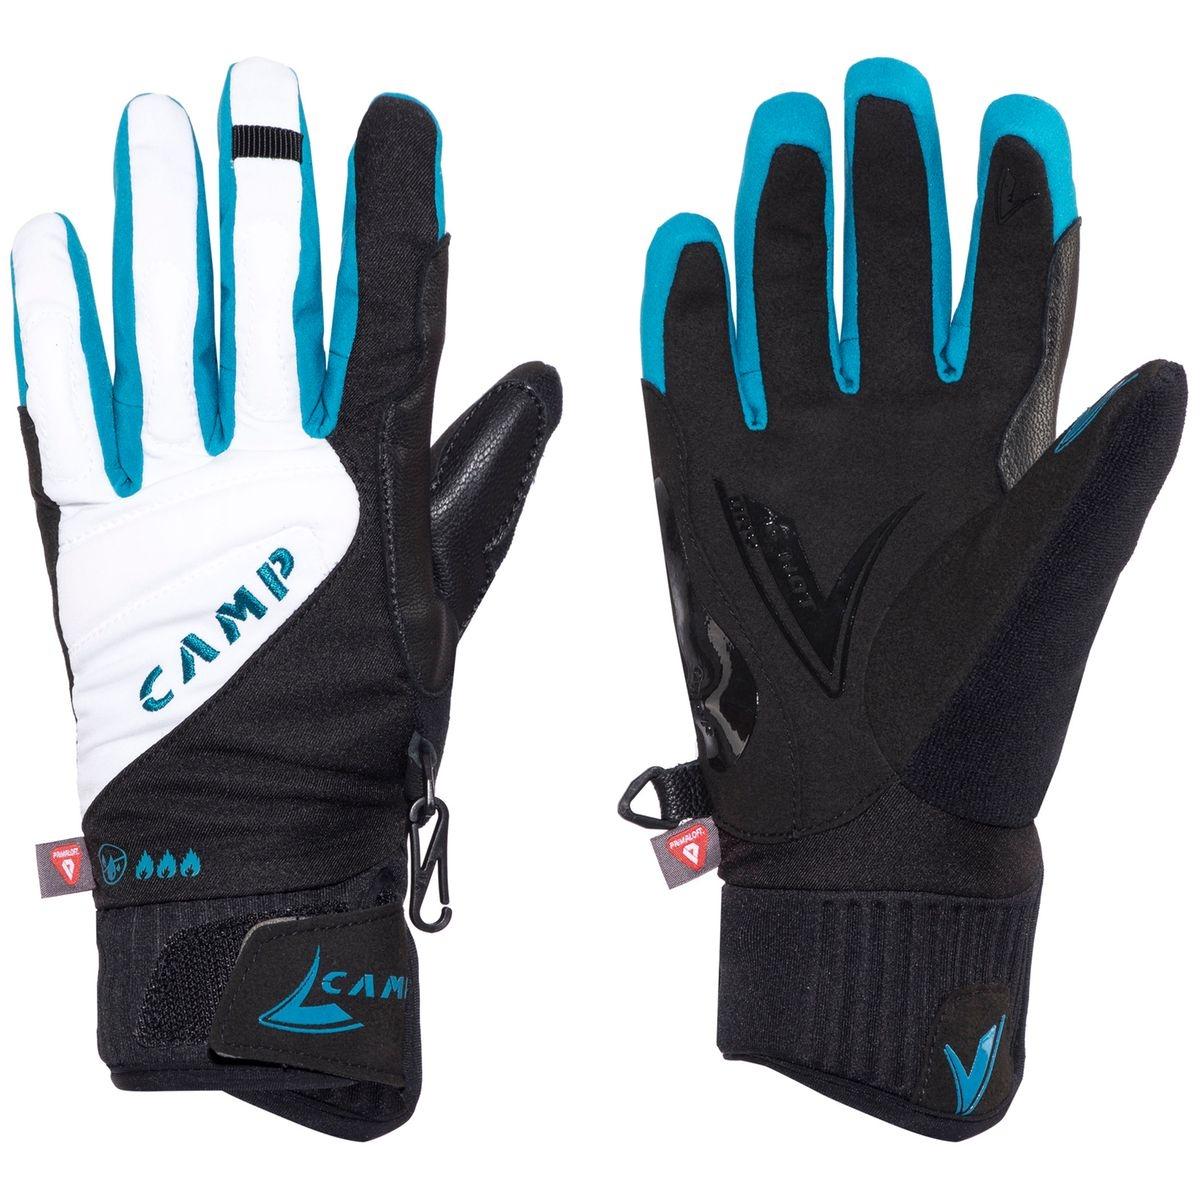 G Hot Dry - Gants - bleu/noir